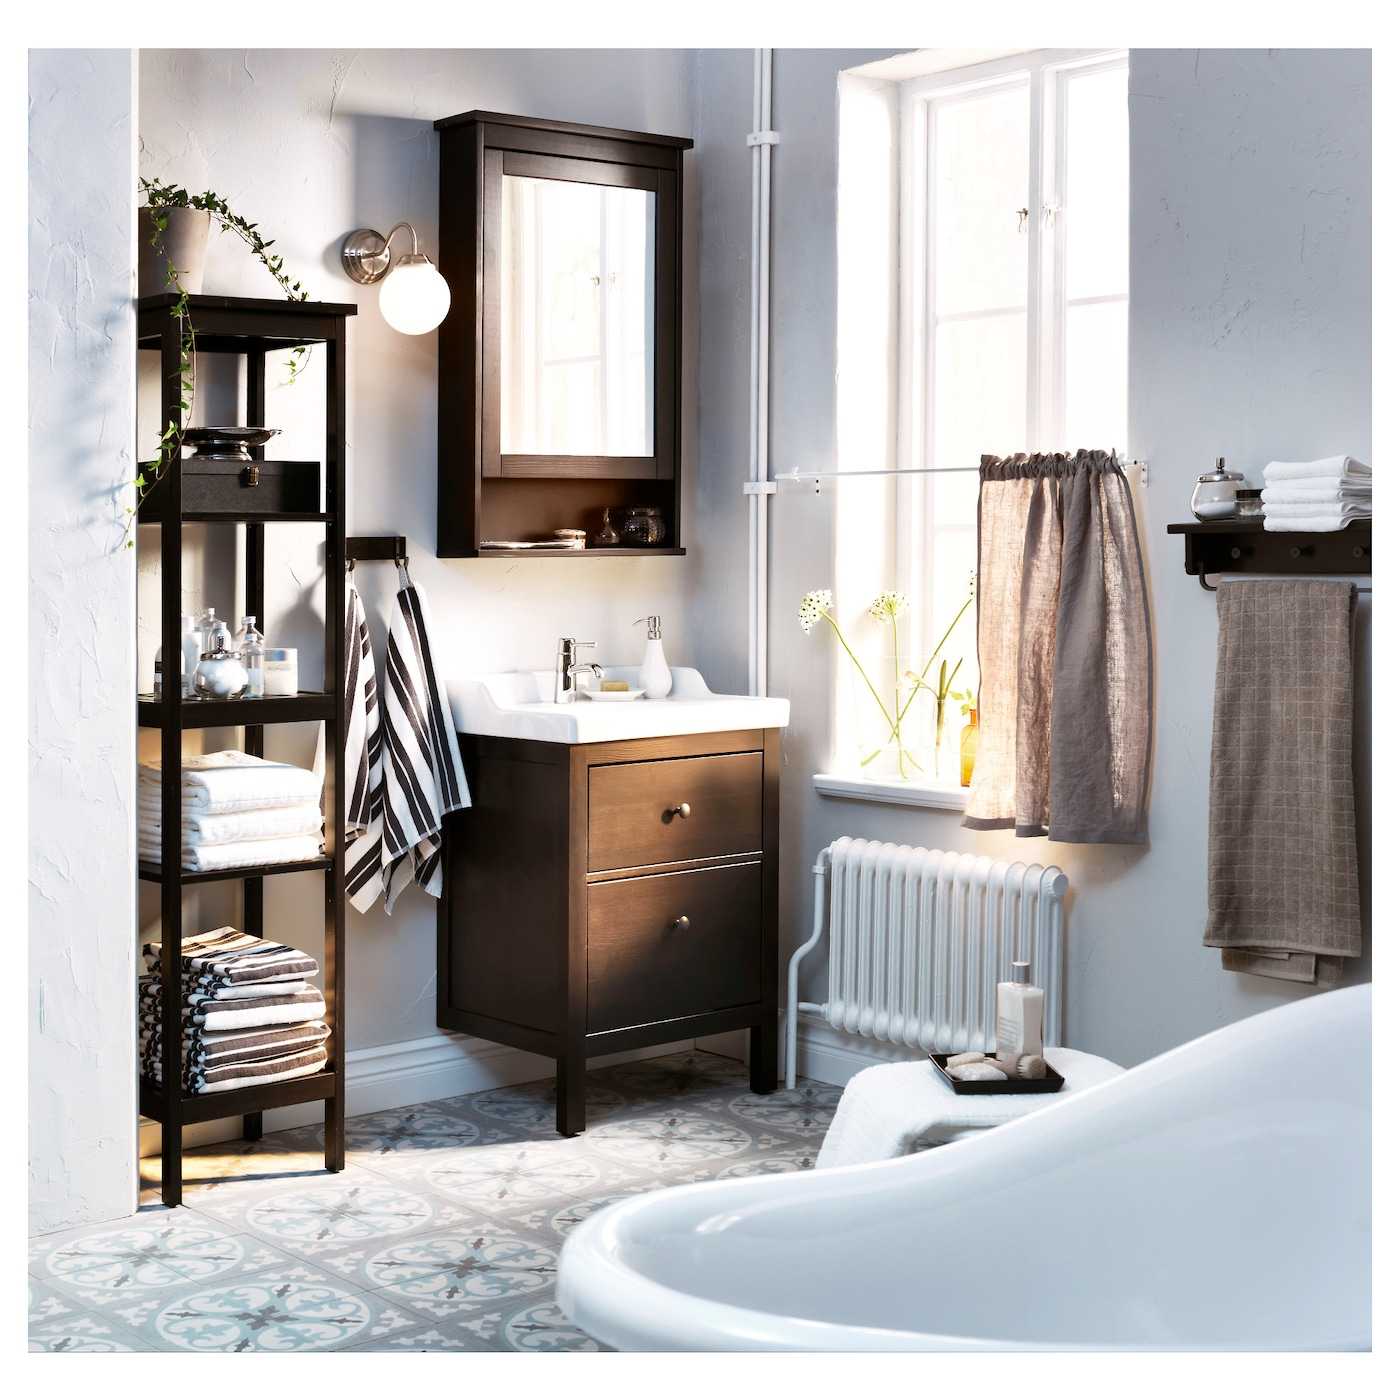 Hemnes Meuble Miroir 1 Porte Teinture Noir Brun 63x16x98 Cm Ikea # Meuble Rangement Noir Bois